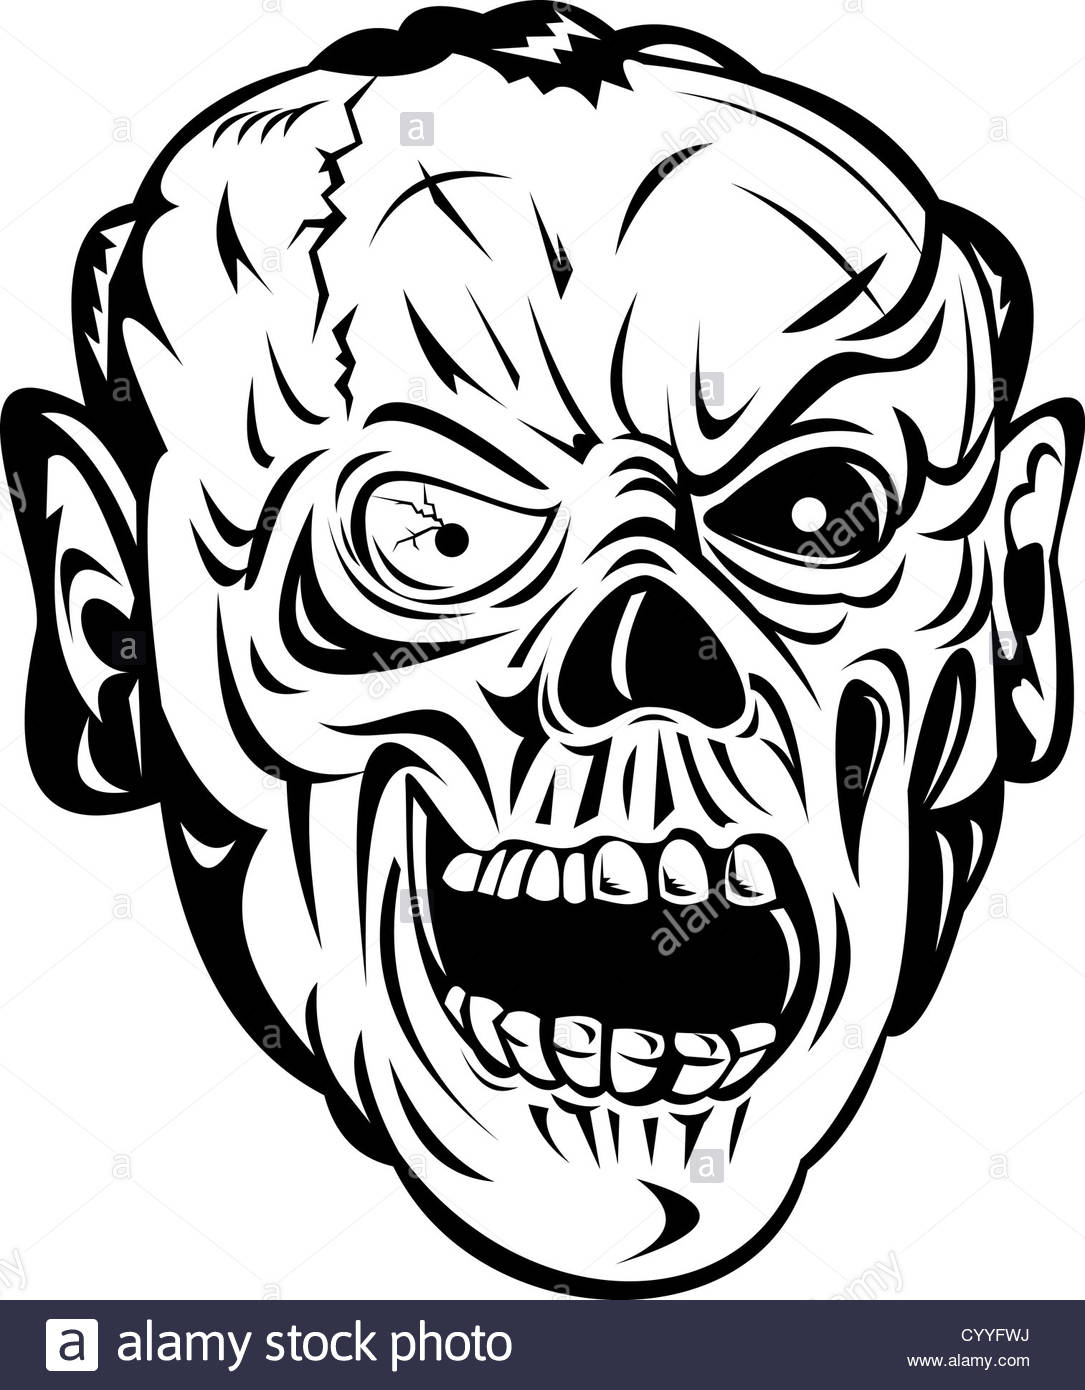 1085x1390 Illustration Of A Skull Face Head Monster Stock Photo, Royalty